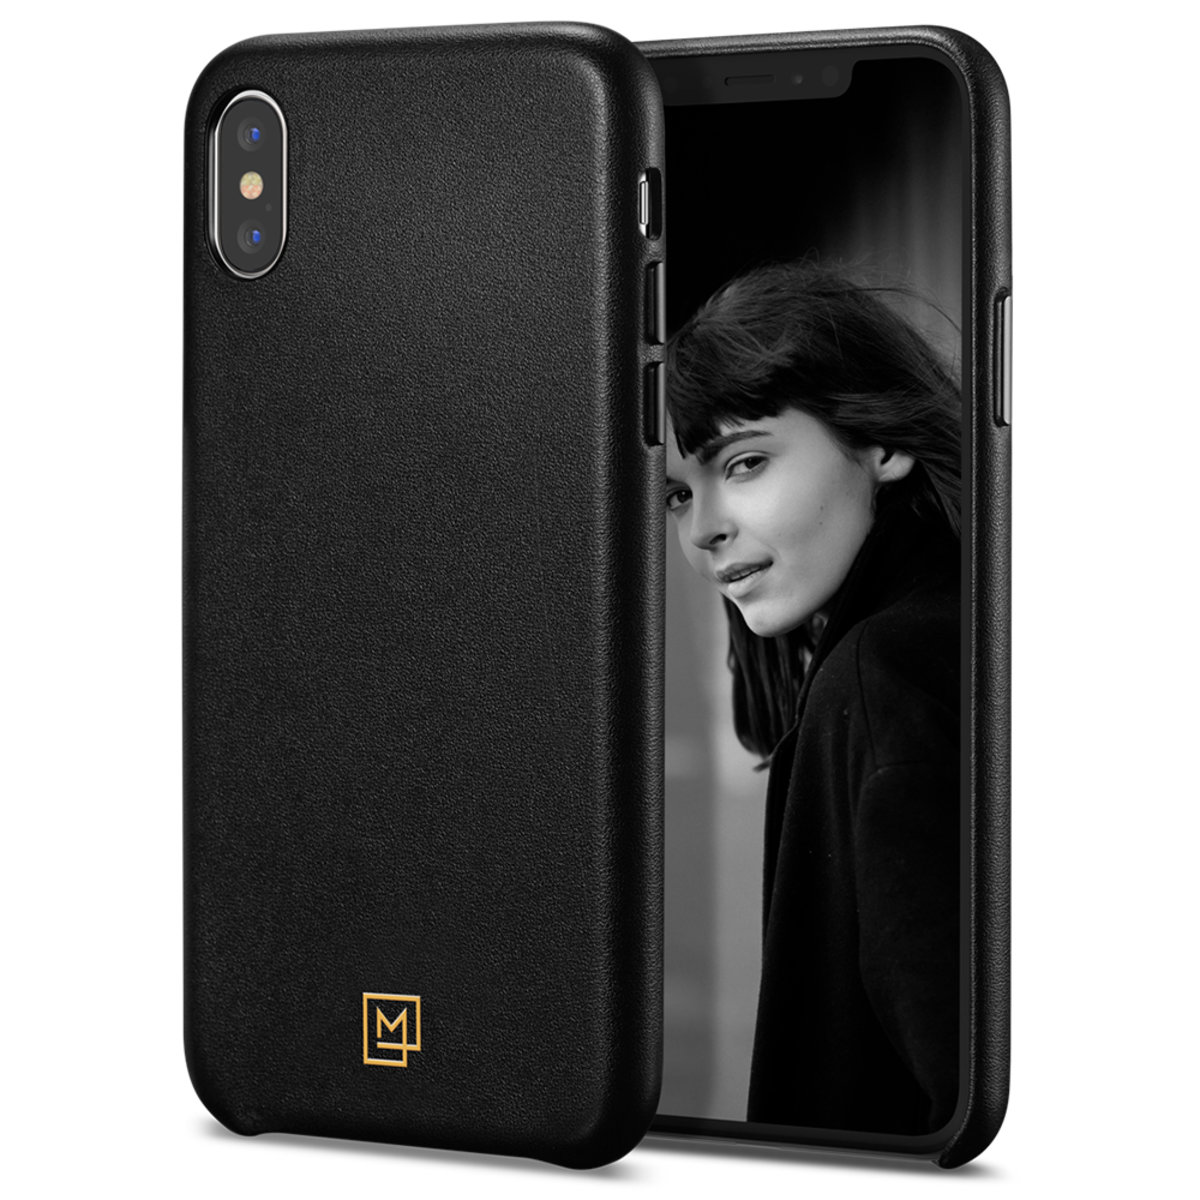 iPhone XS / X Case La Manon câlin - Chic Black